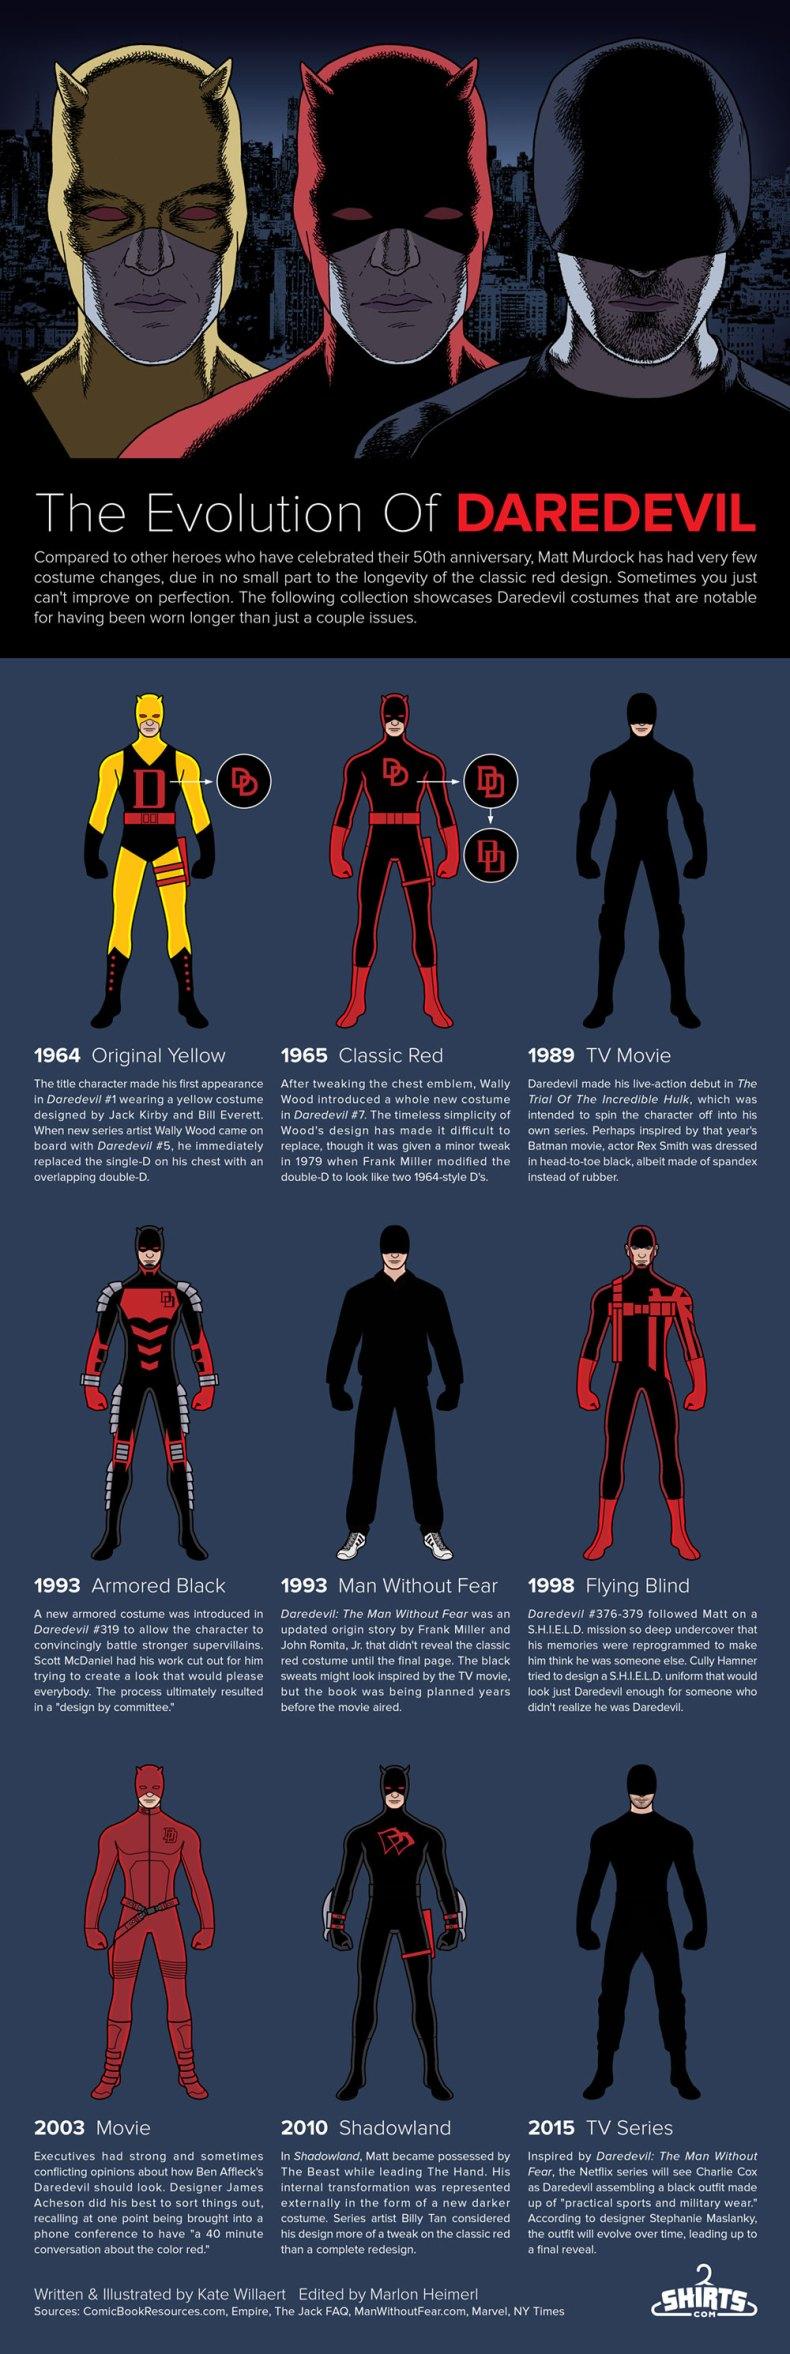 Daredevil-Infographic